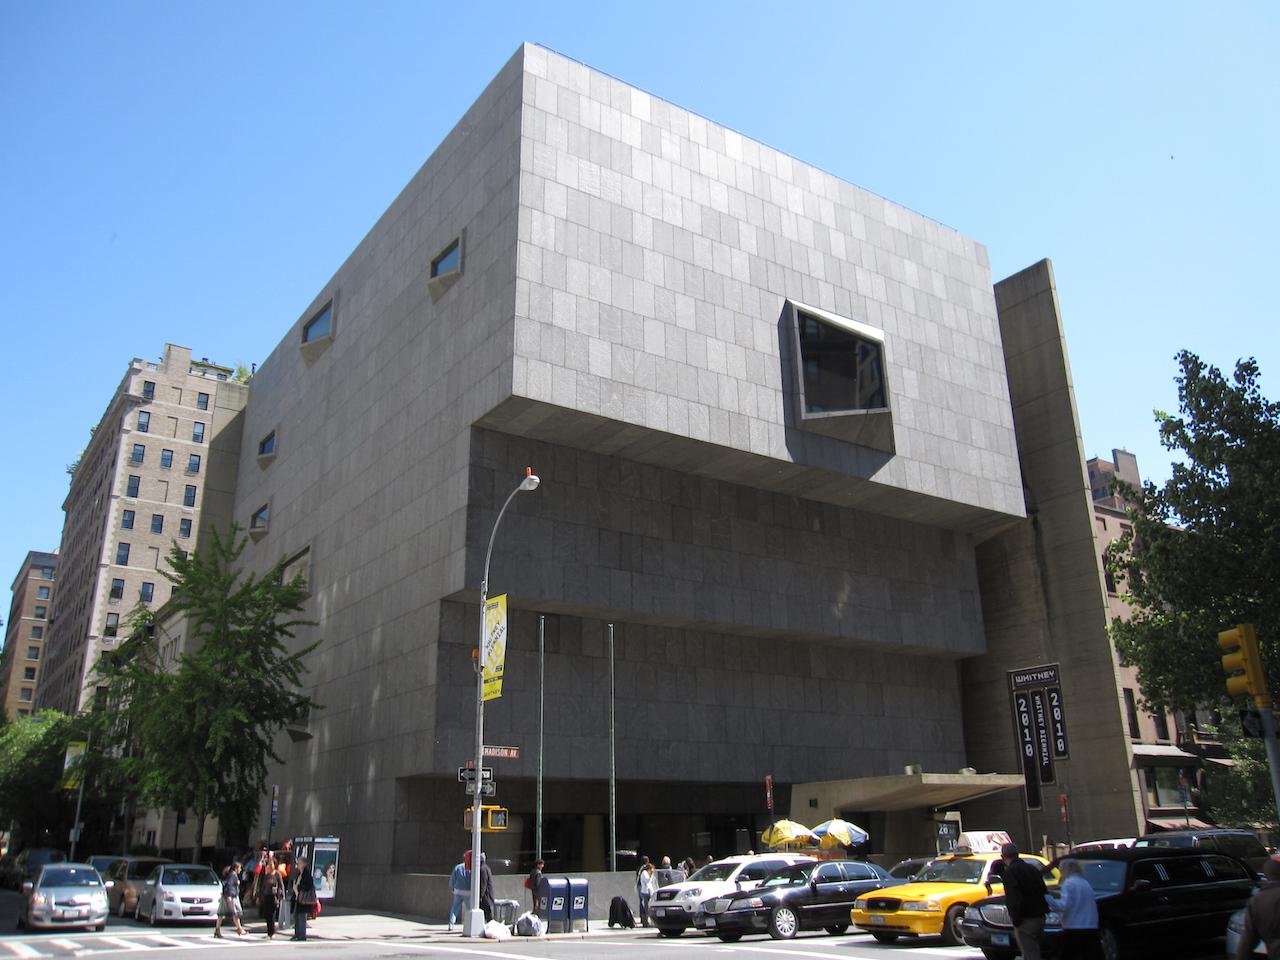 The Breuer Building (photo via Wikipedia)